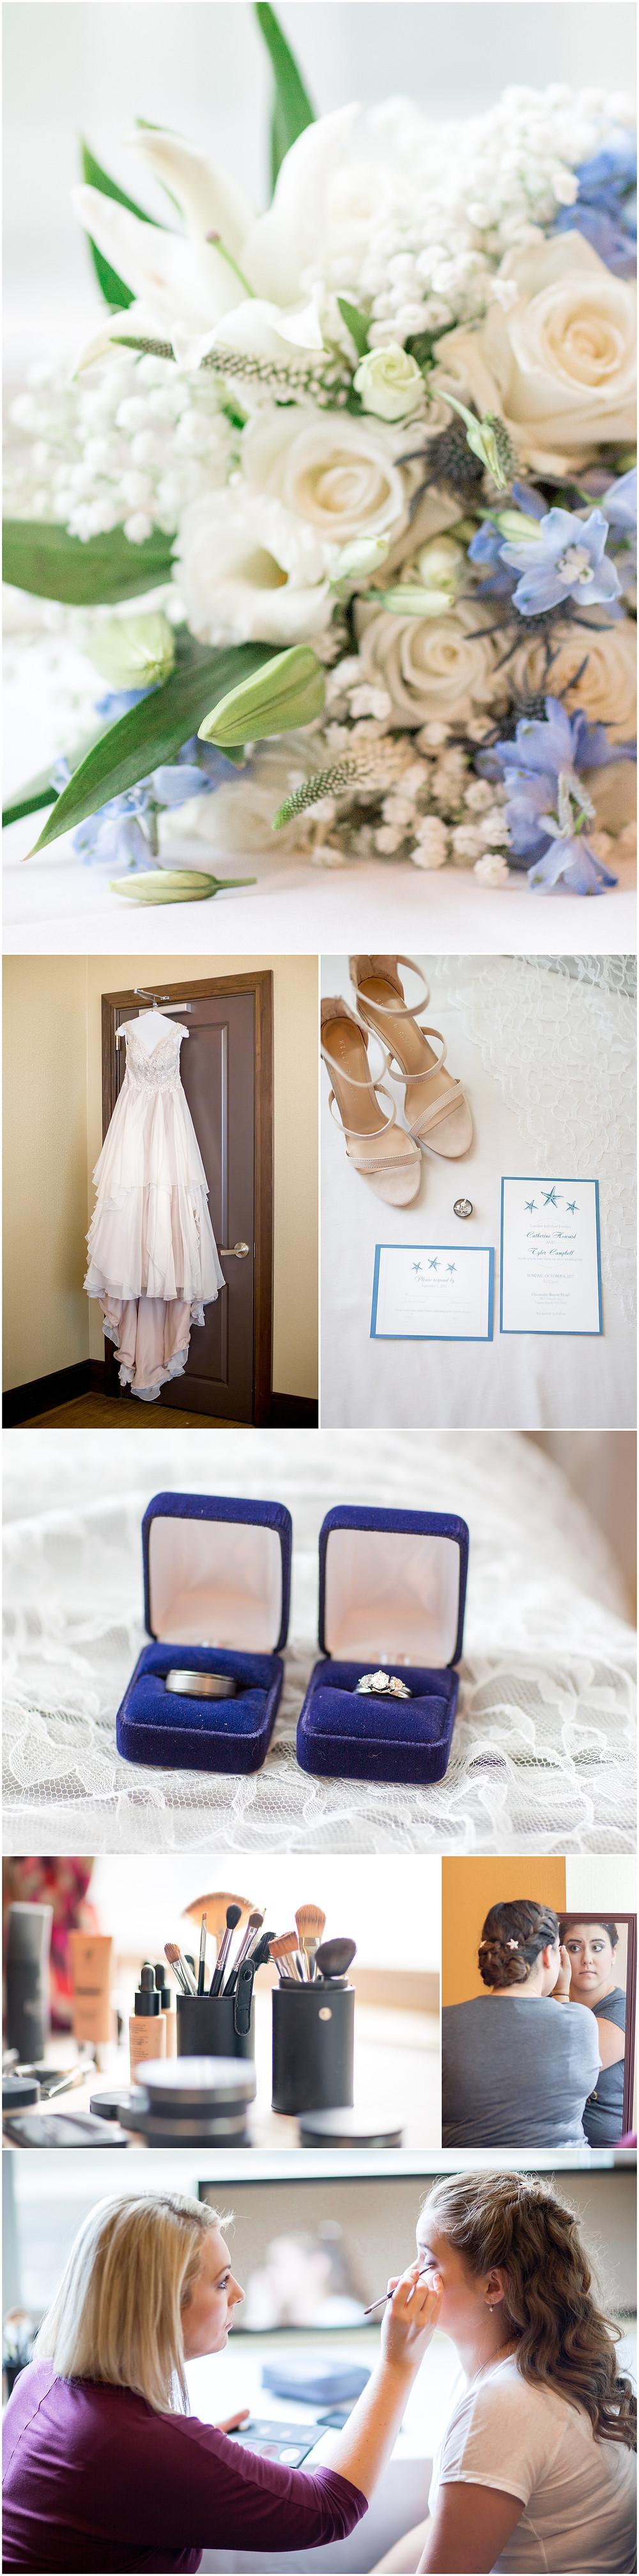 Wedding flowers, wedding dress, invitations, shoes, wedding rings, bridal makeup